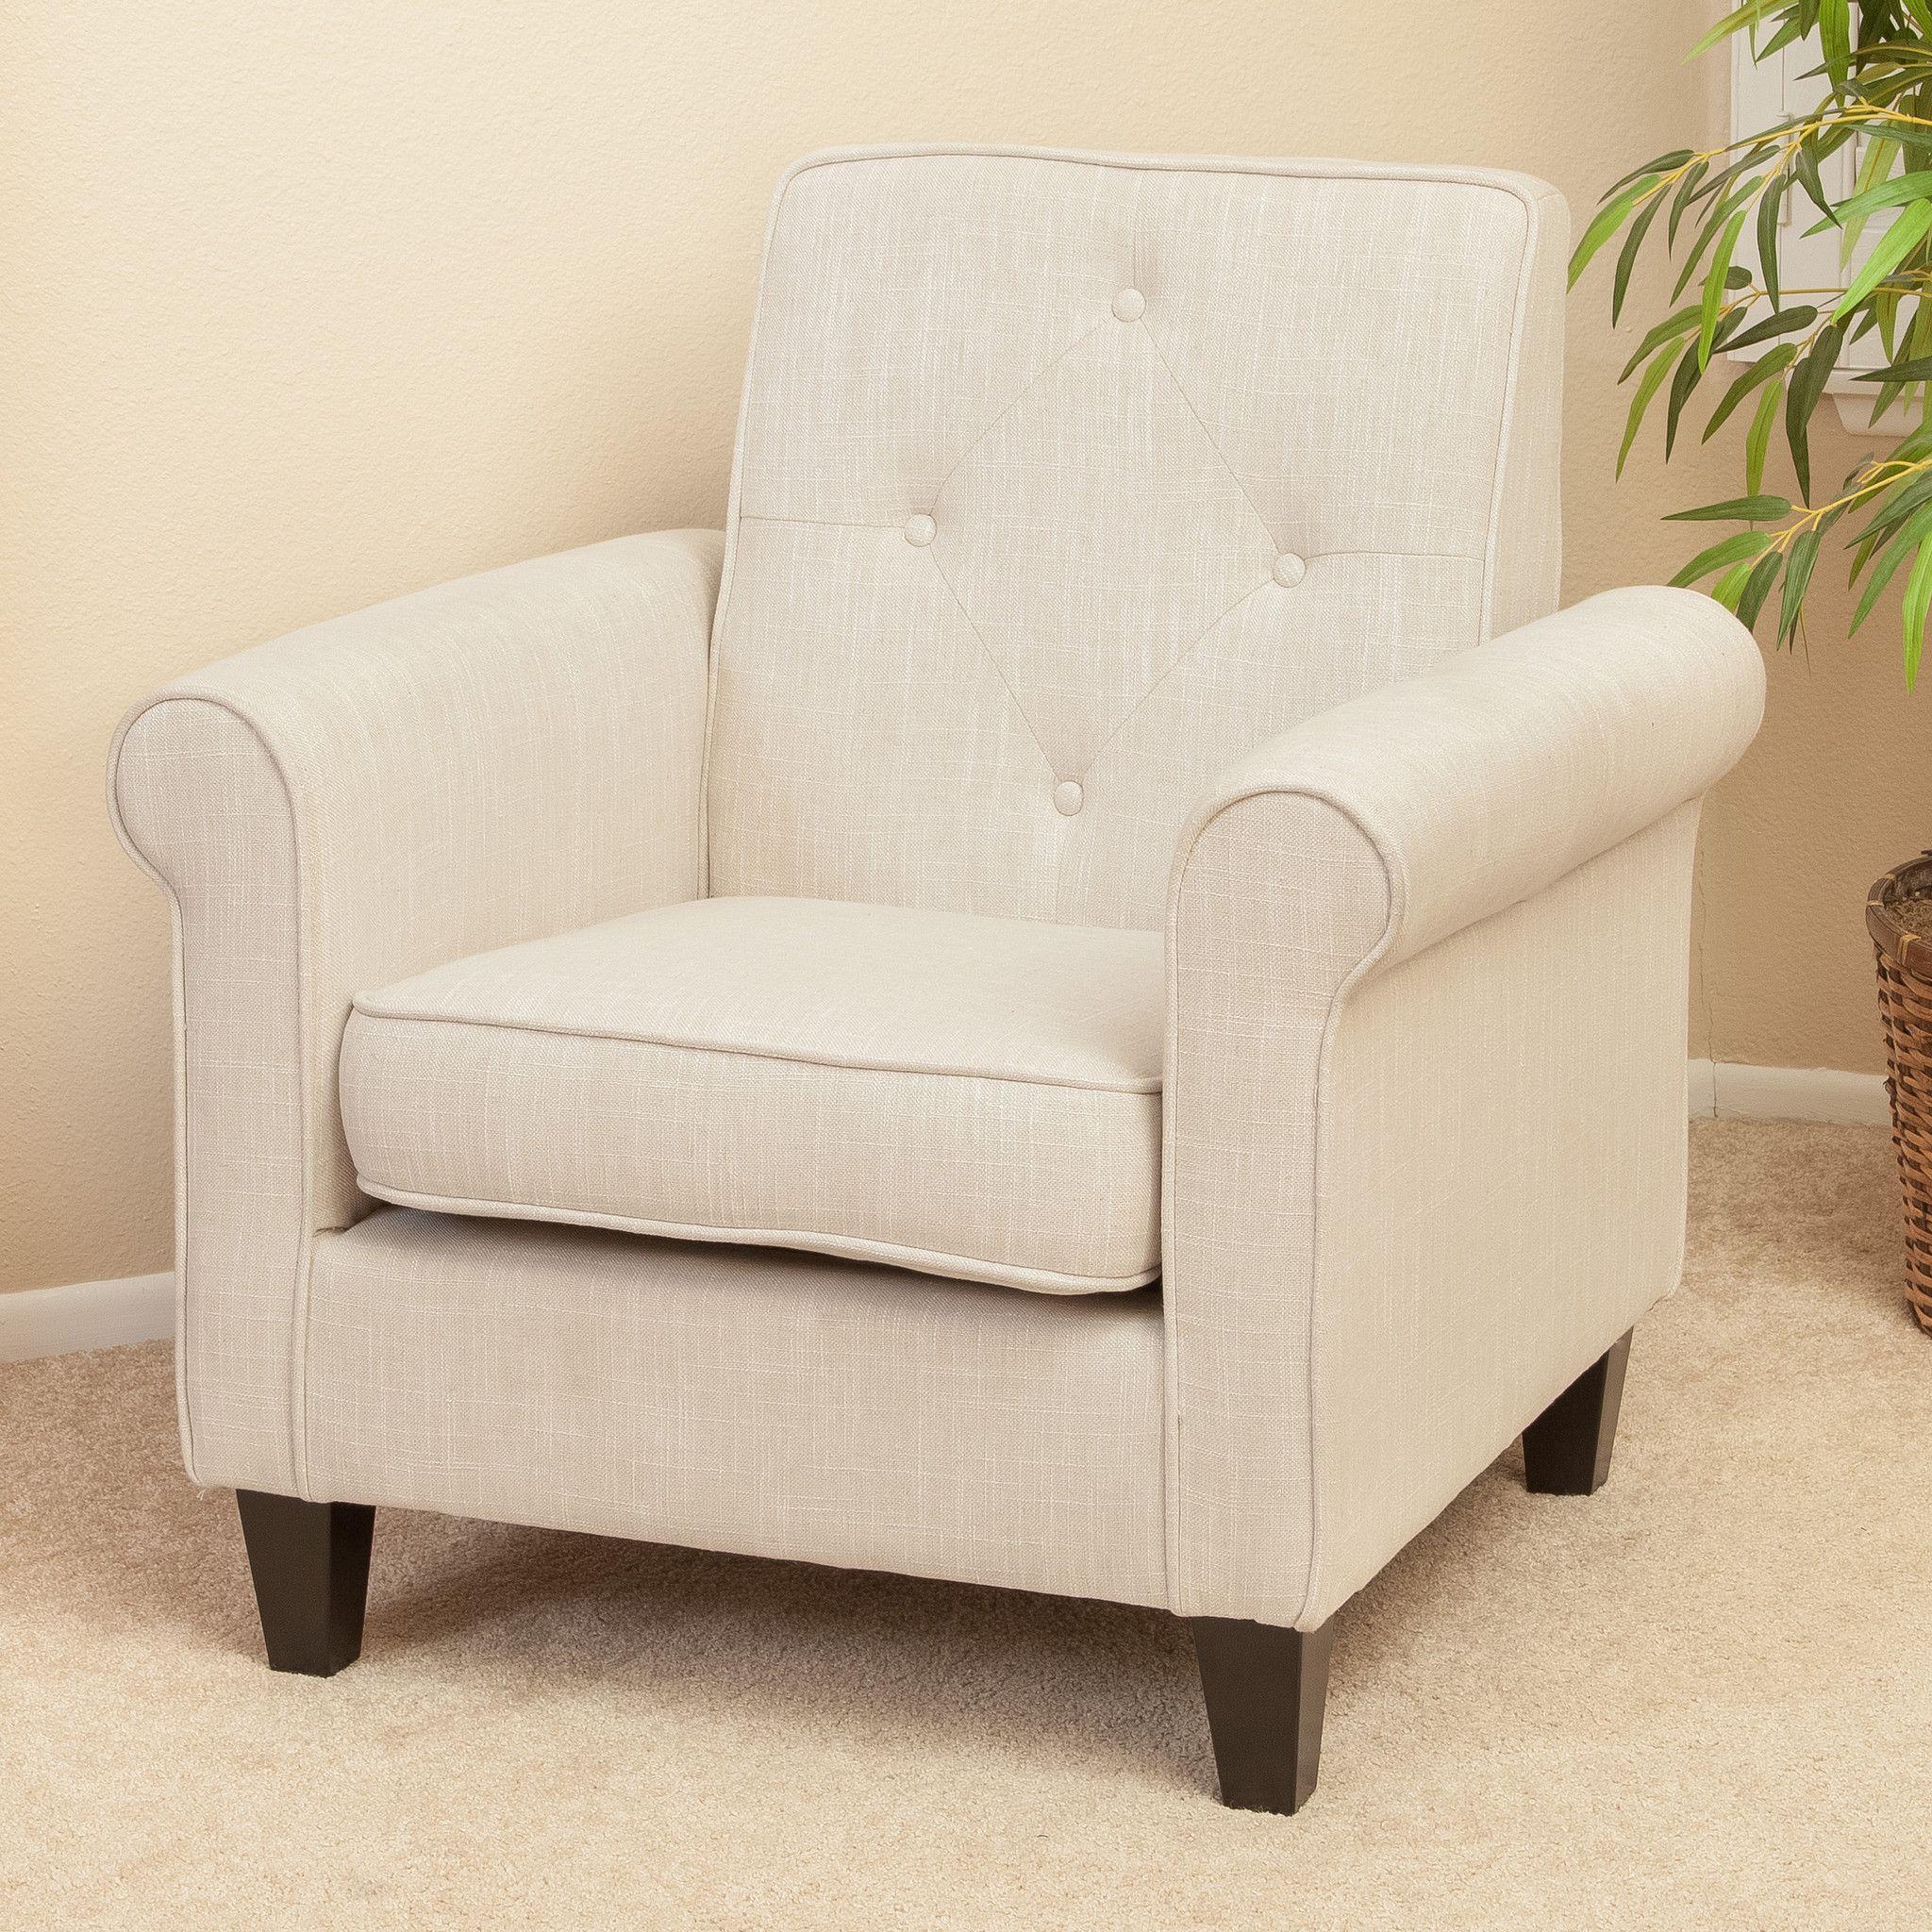 blog chair chairs fantastic room desk dorm